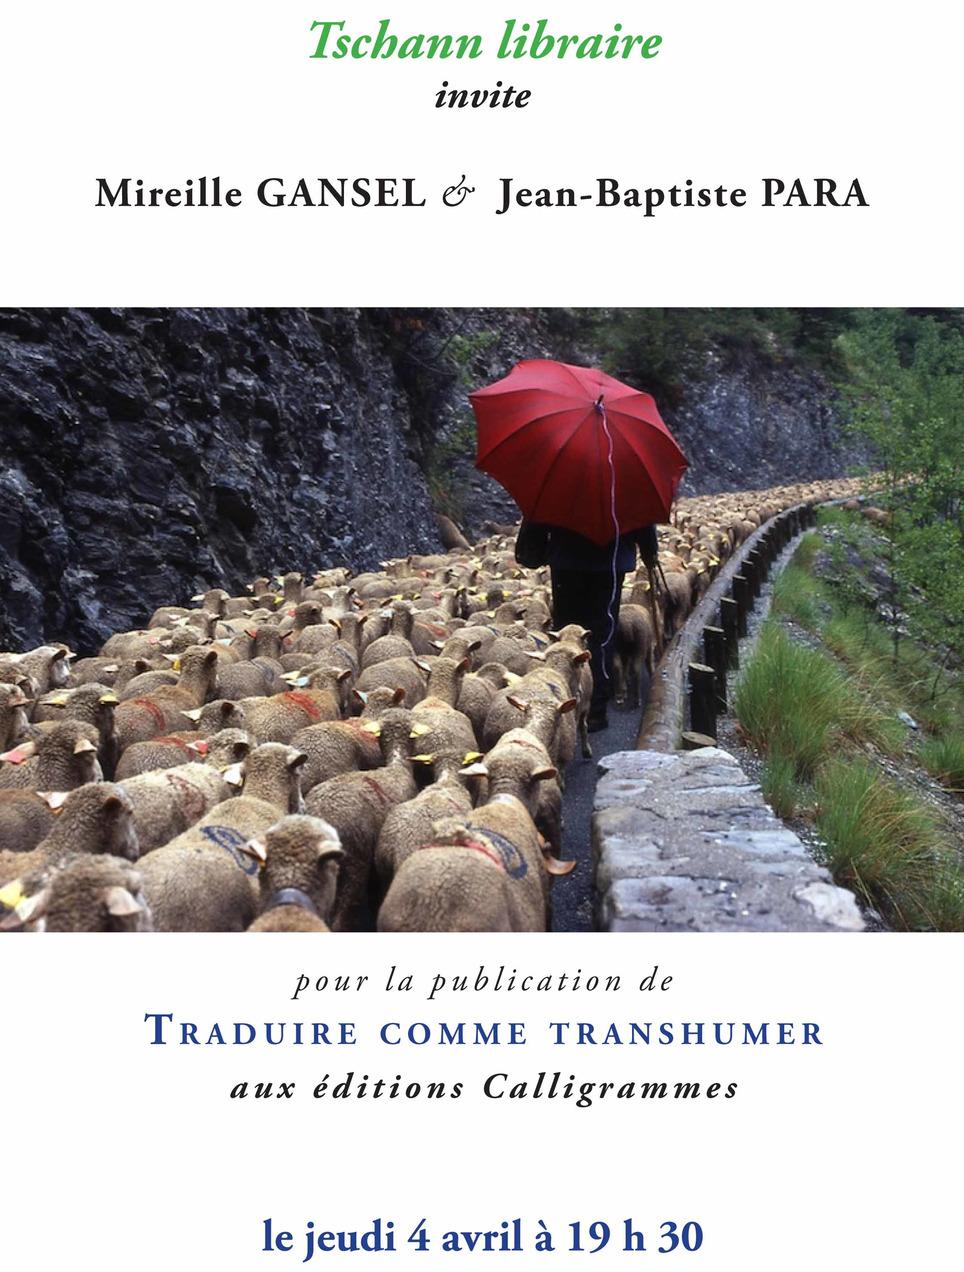 Mireille Gansel, Paris, le 4 avril 2013 | Poezibao | Scoop.it